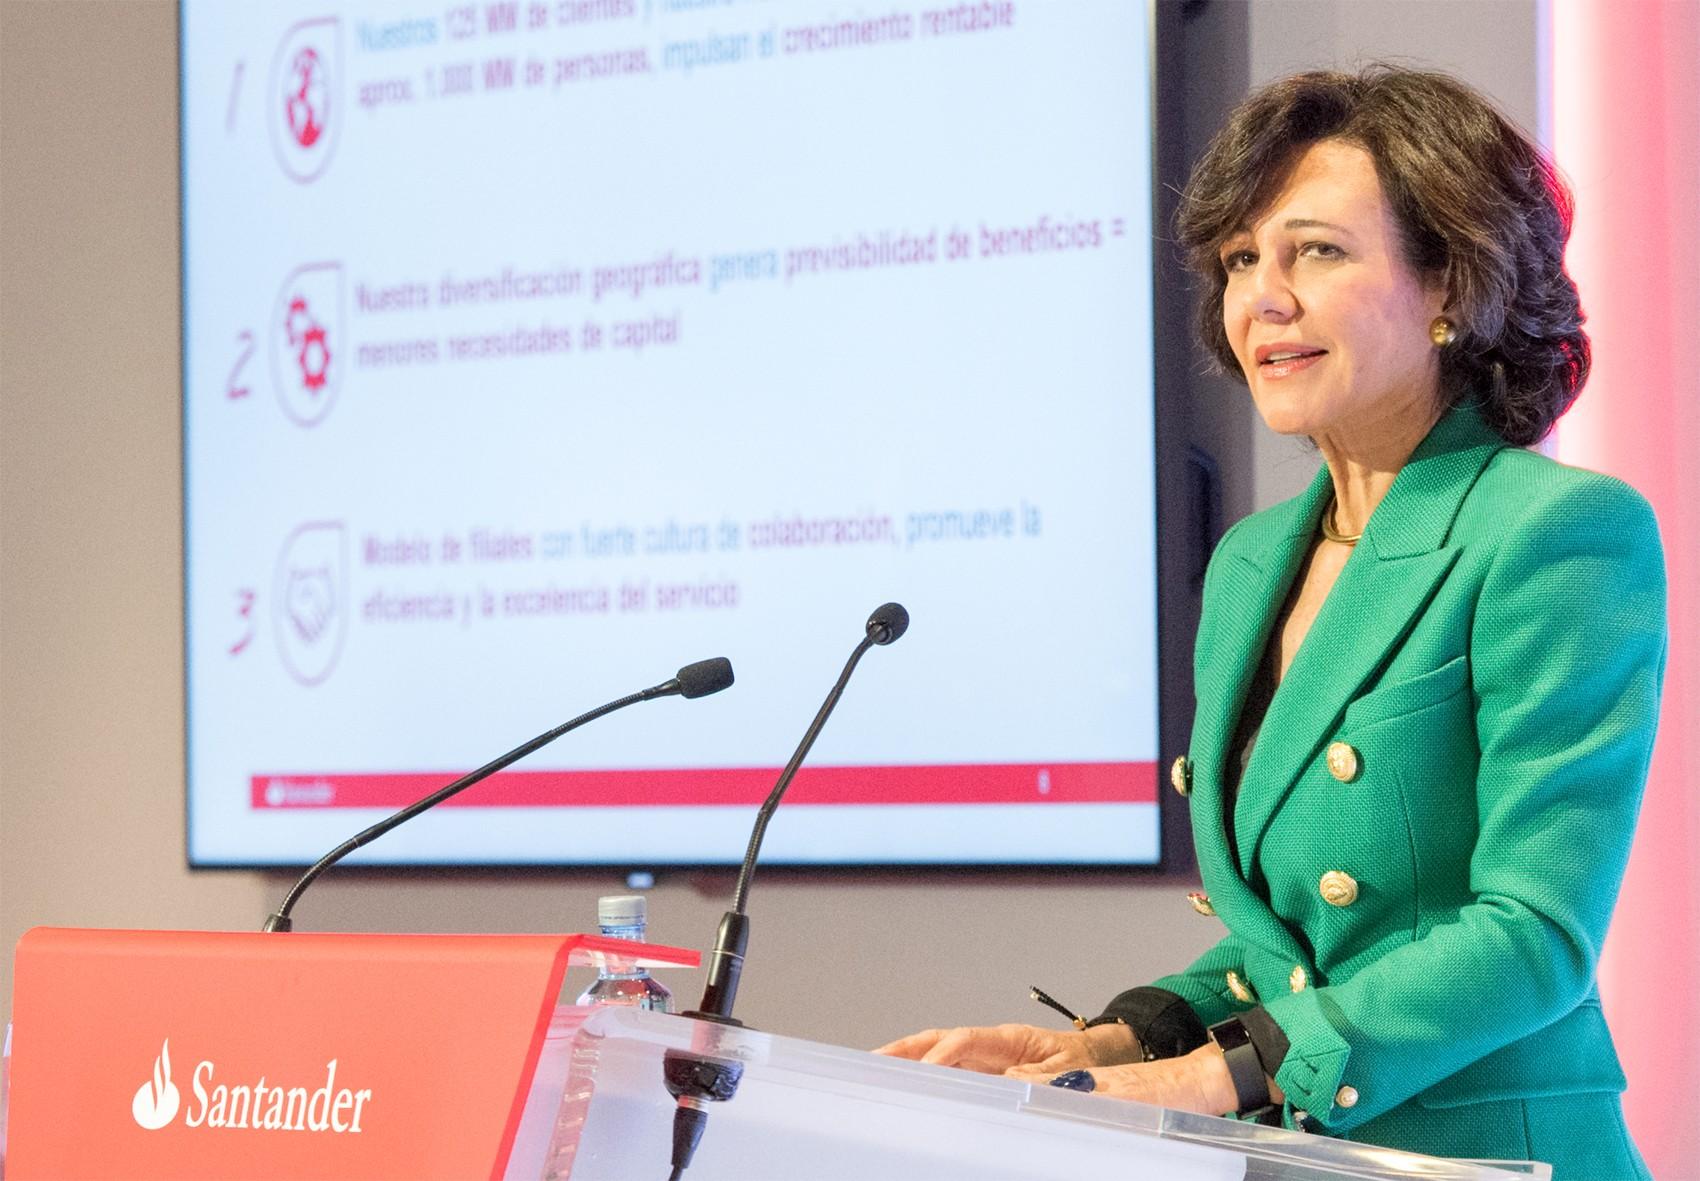 Ana Patricia Botín-Sanz de Sautuola O'Shea